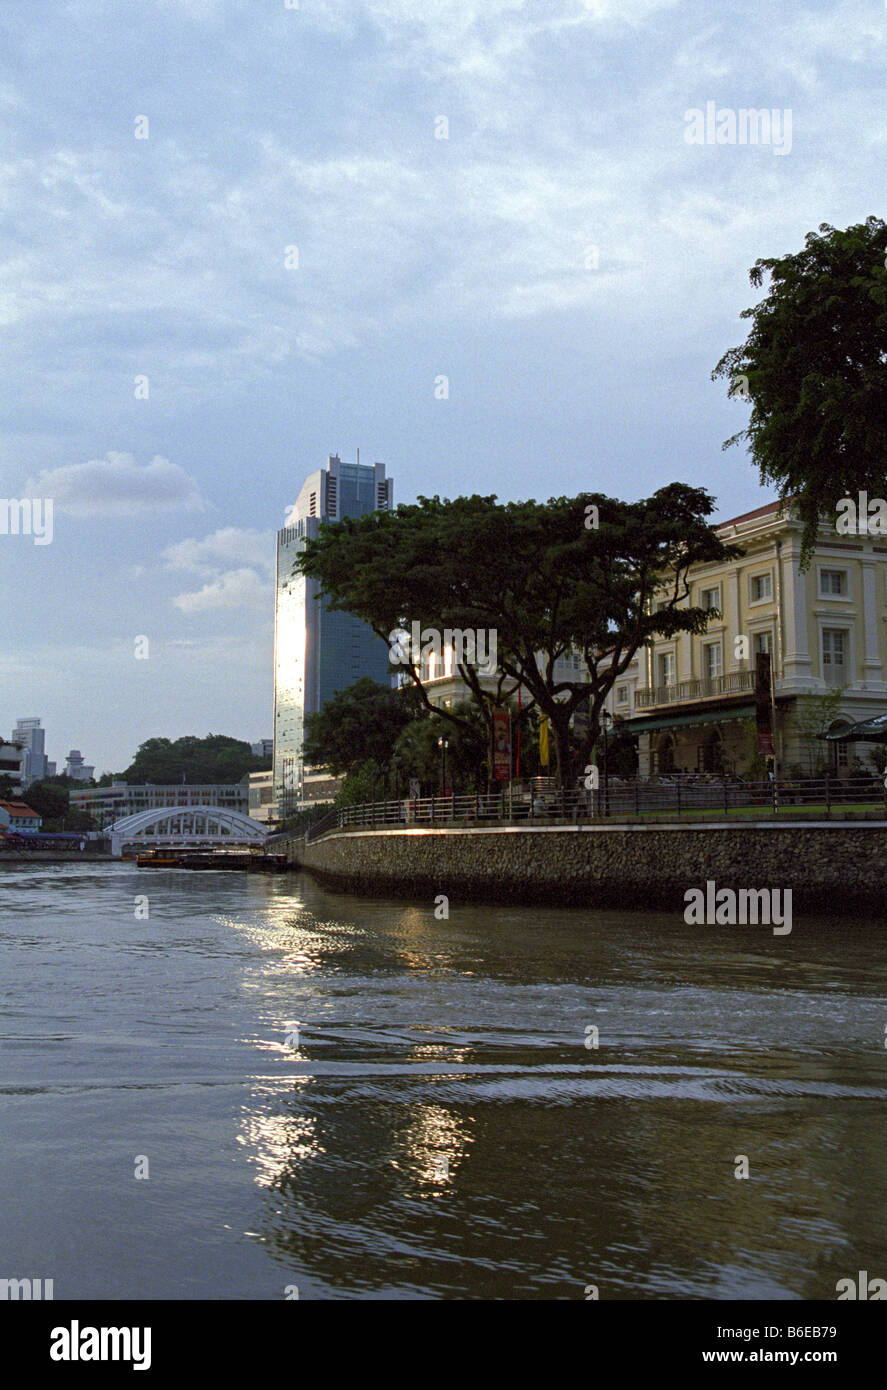 Asian Civilisations Museum, Singapore River, Singapore - Stock Image